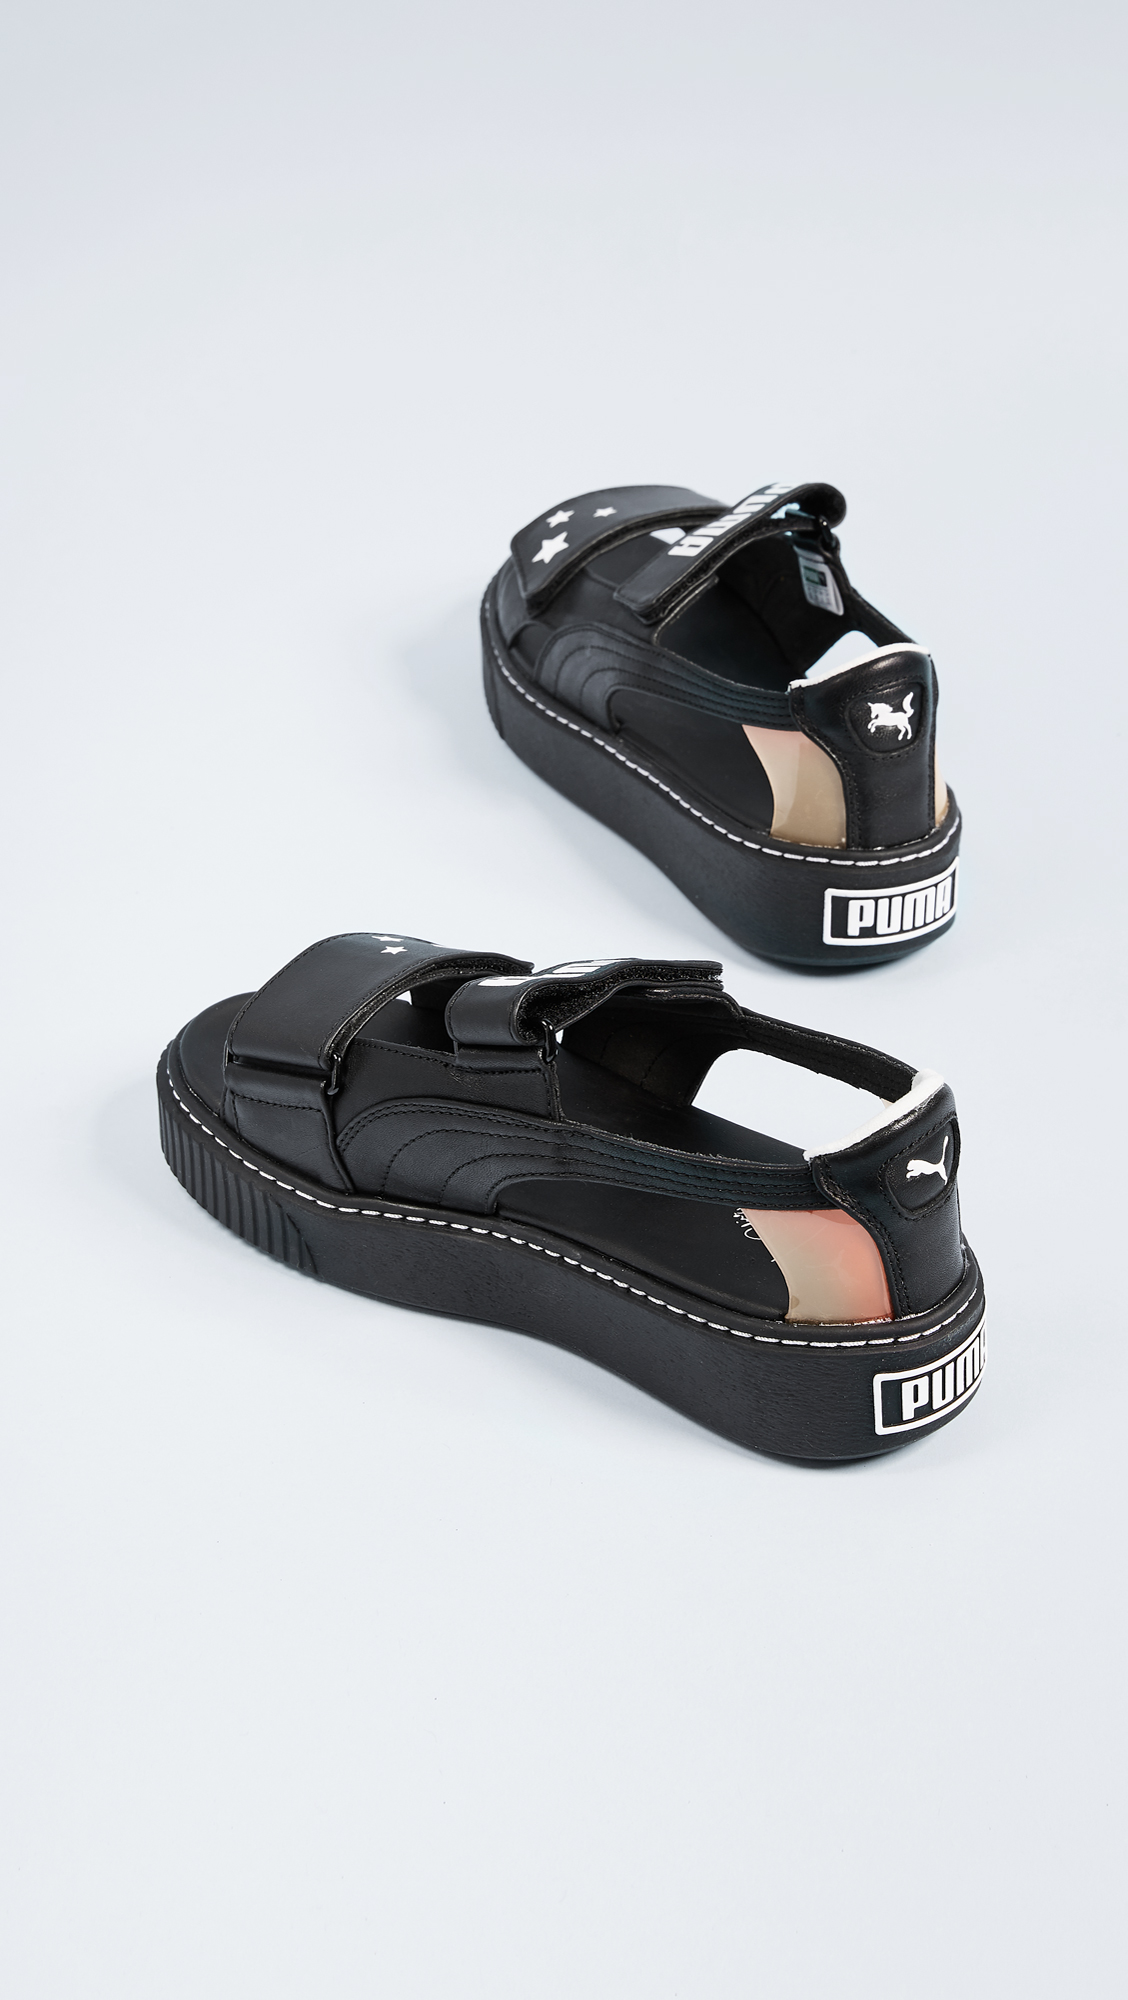 e7703adbf24c38 PUMA x SOPHIA WEBSTER Platform Sandals